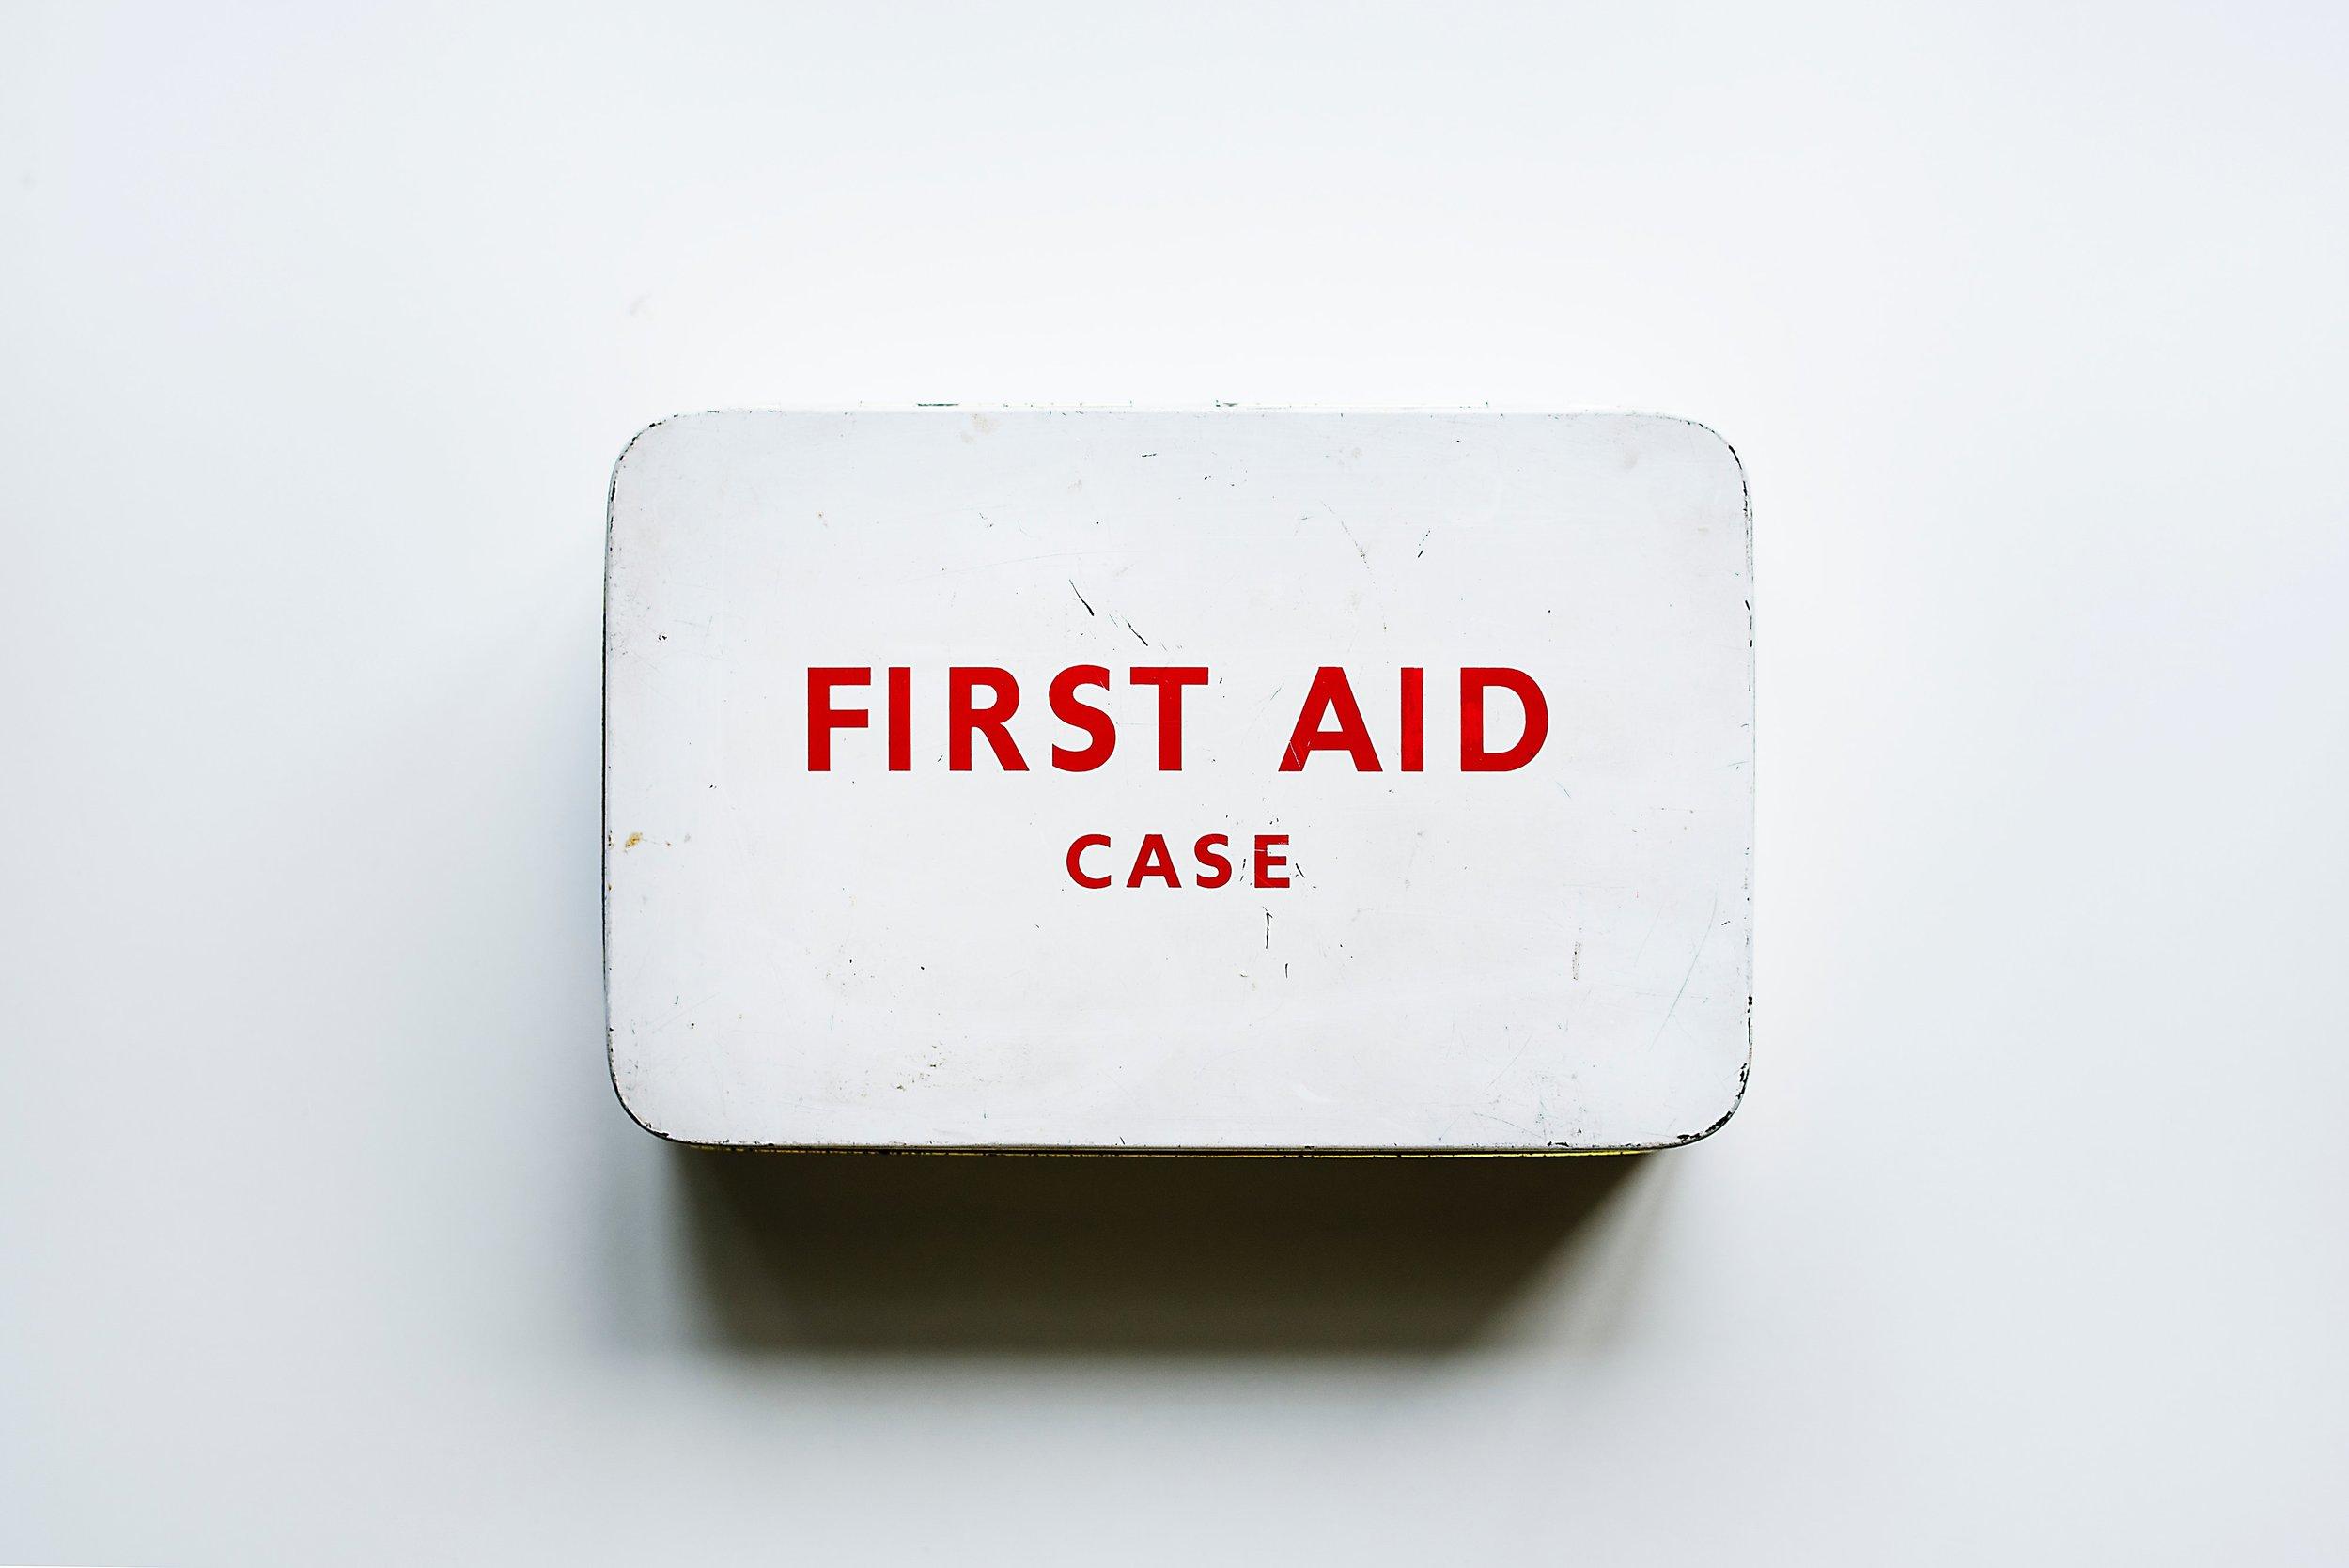 care-case-cure-1327217.jpg